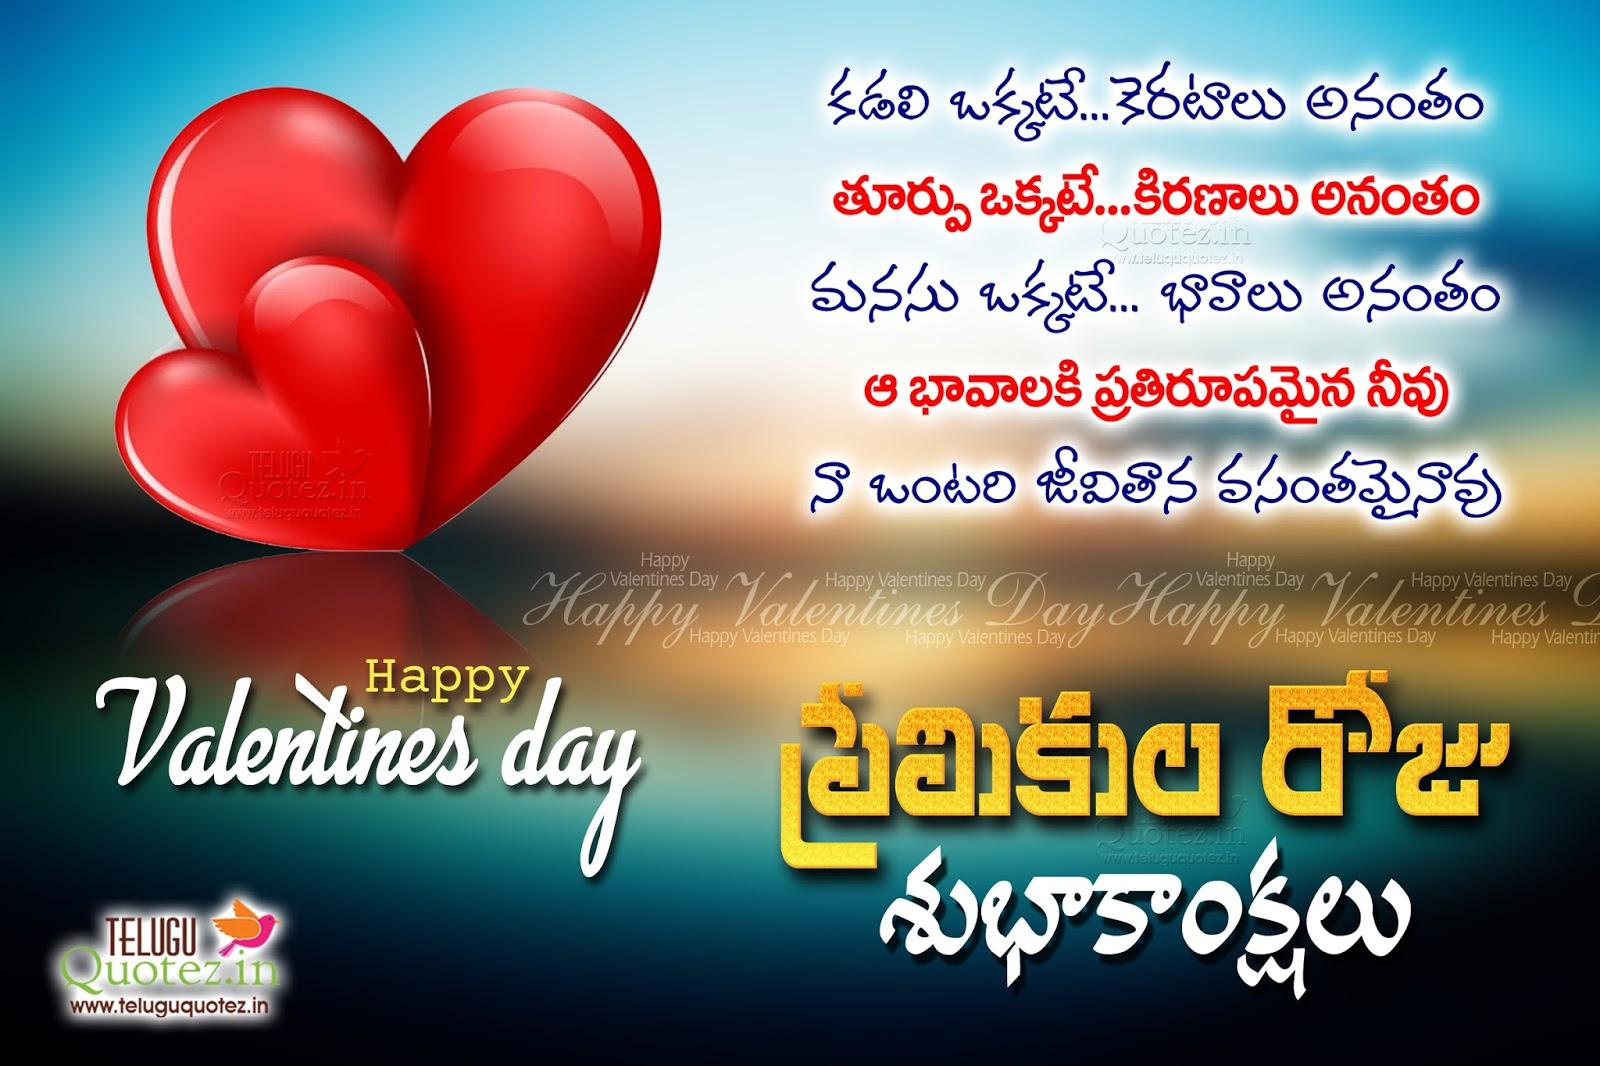 Valentines Day Quotes In Telugu Greeting Wishes Teluguquotezin